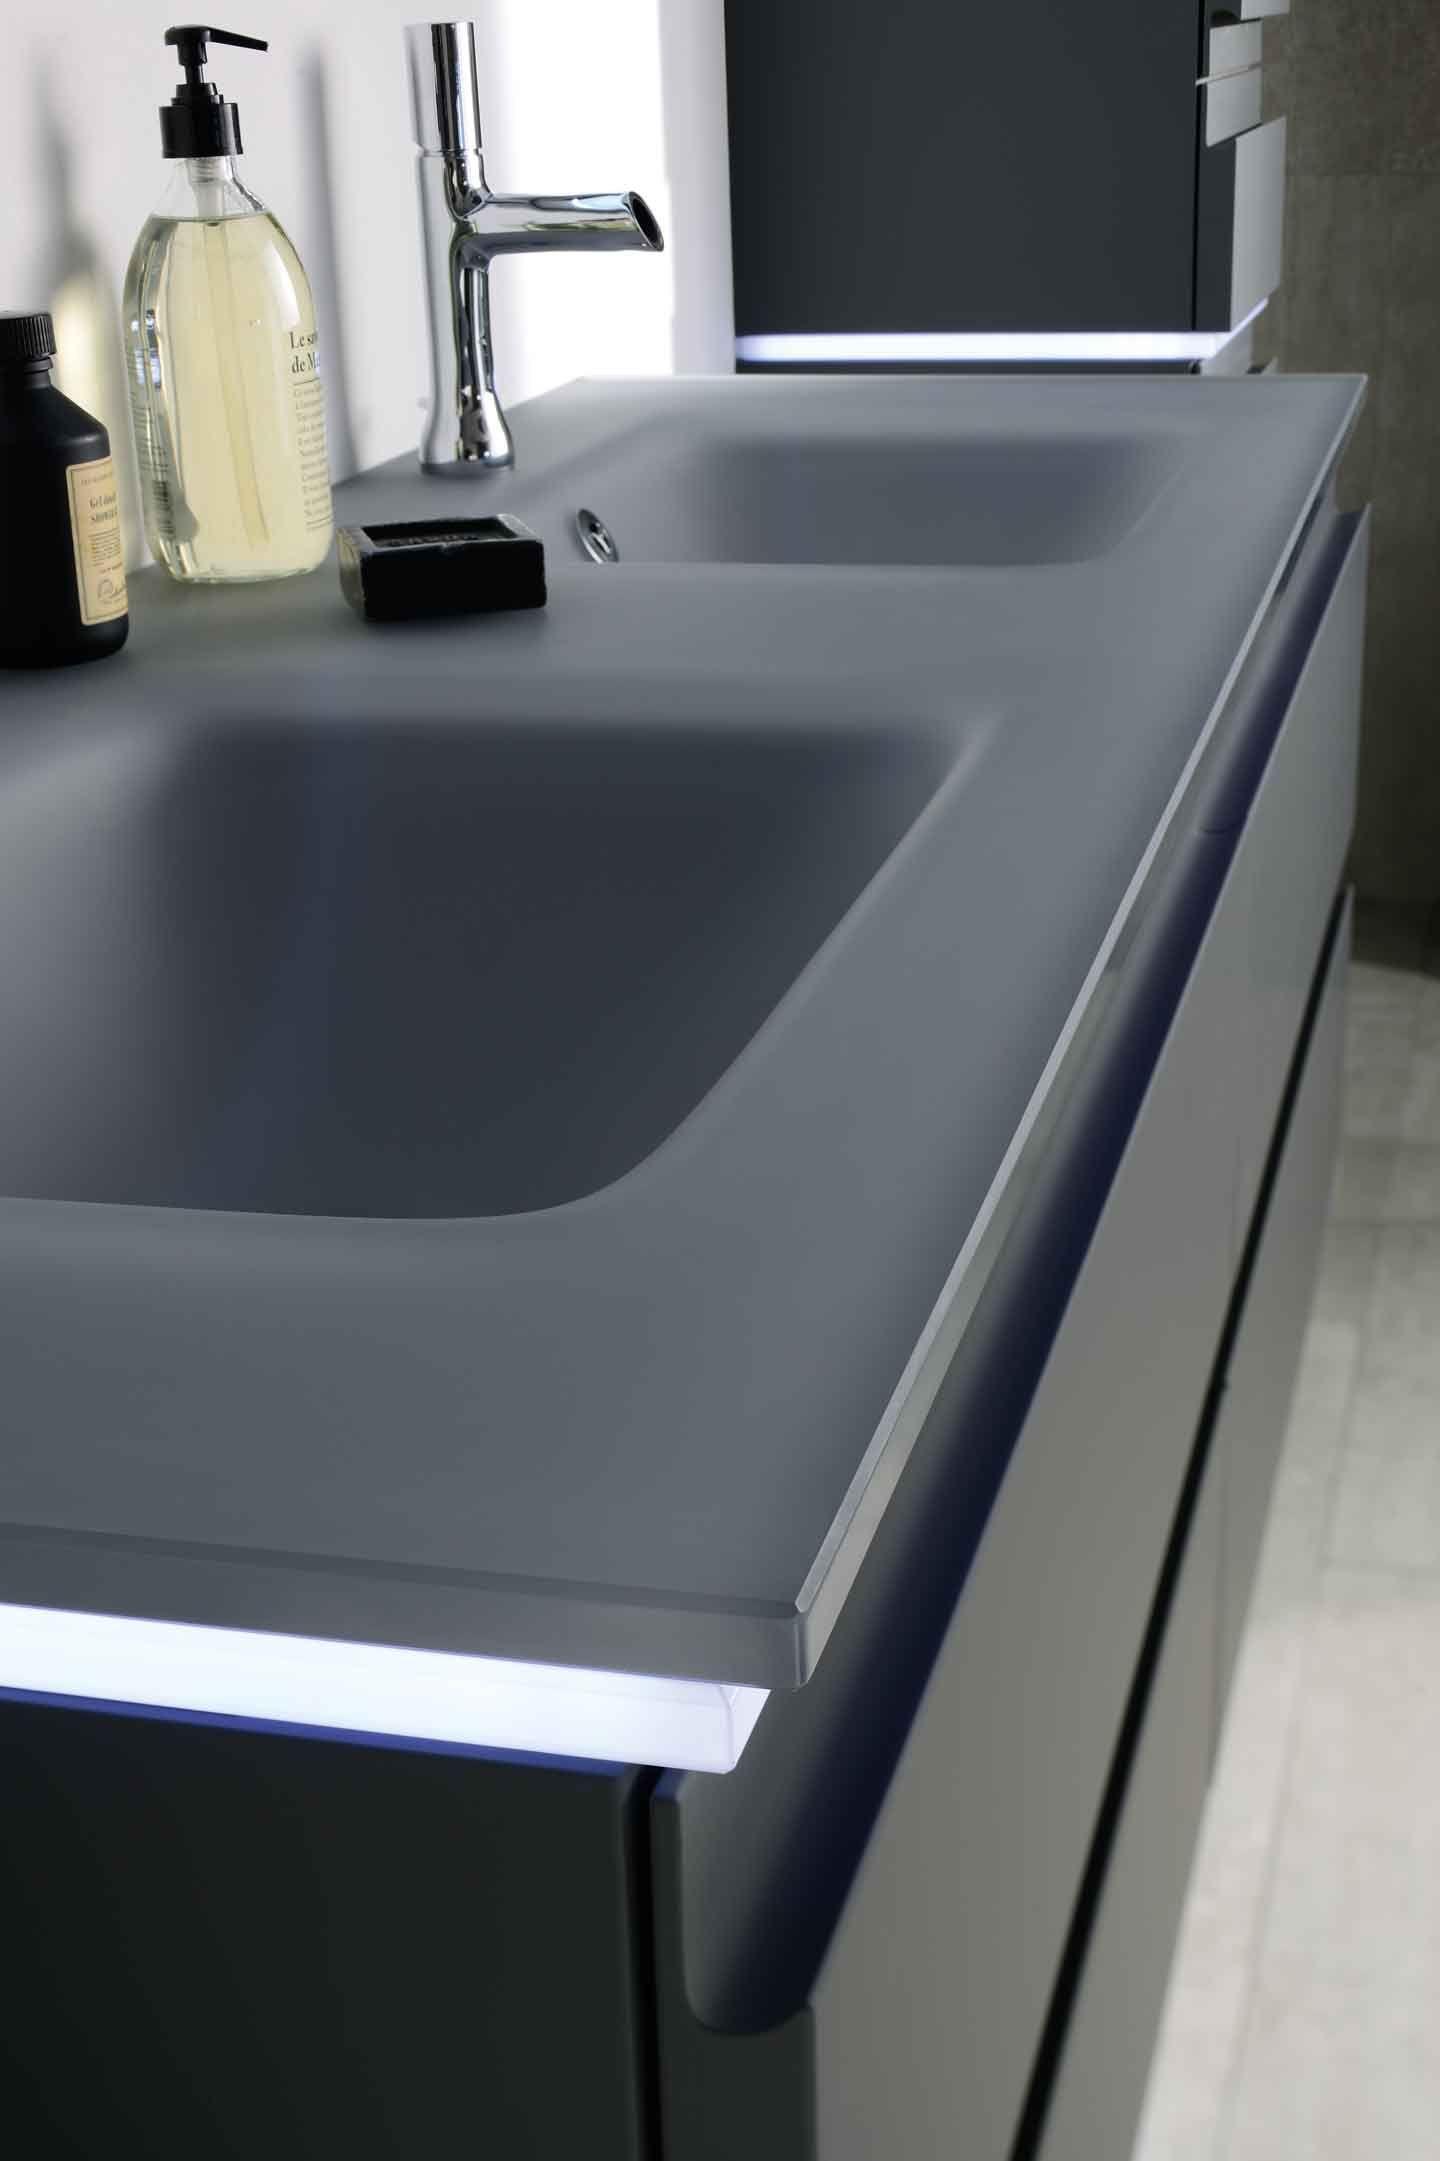 meuble halo, Sanijura, Plan vasque en verre gris givré | Bathroom en ...